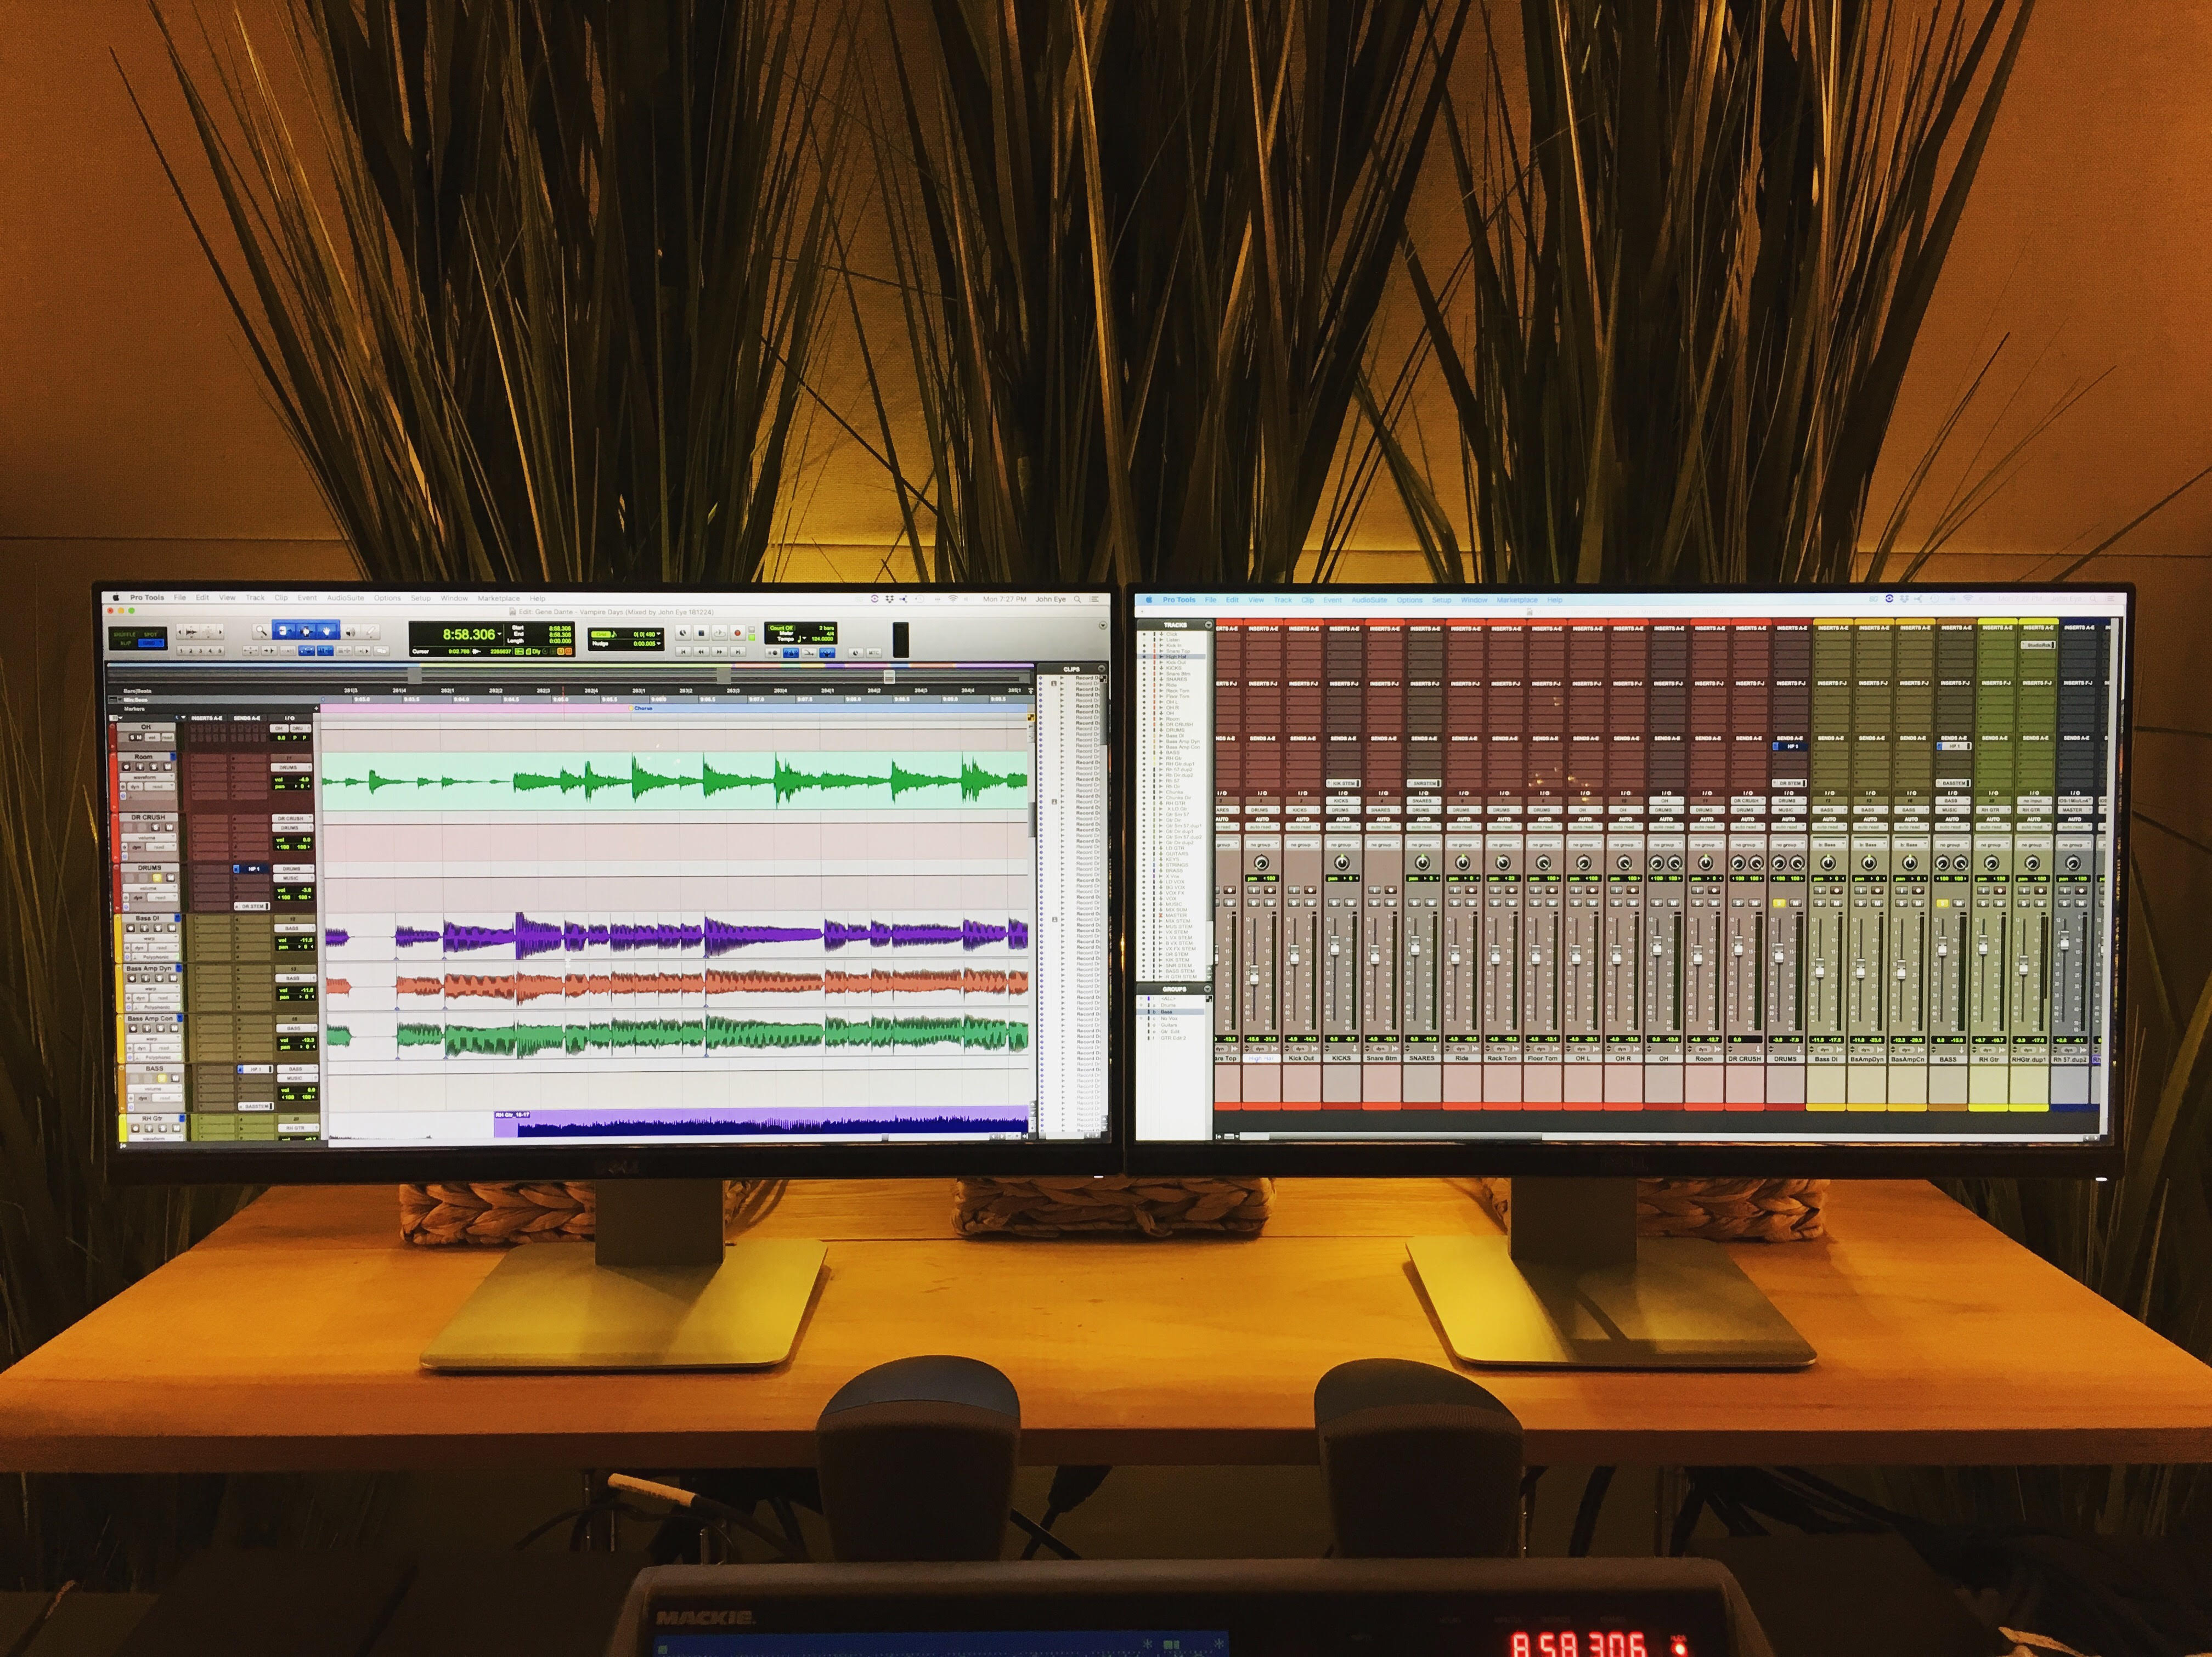 Studio Gear - JOHN EYE PRODUCTIONS / BEACH HOUSE STUDIOS